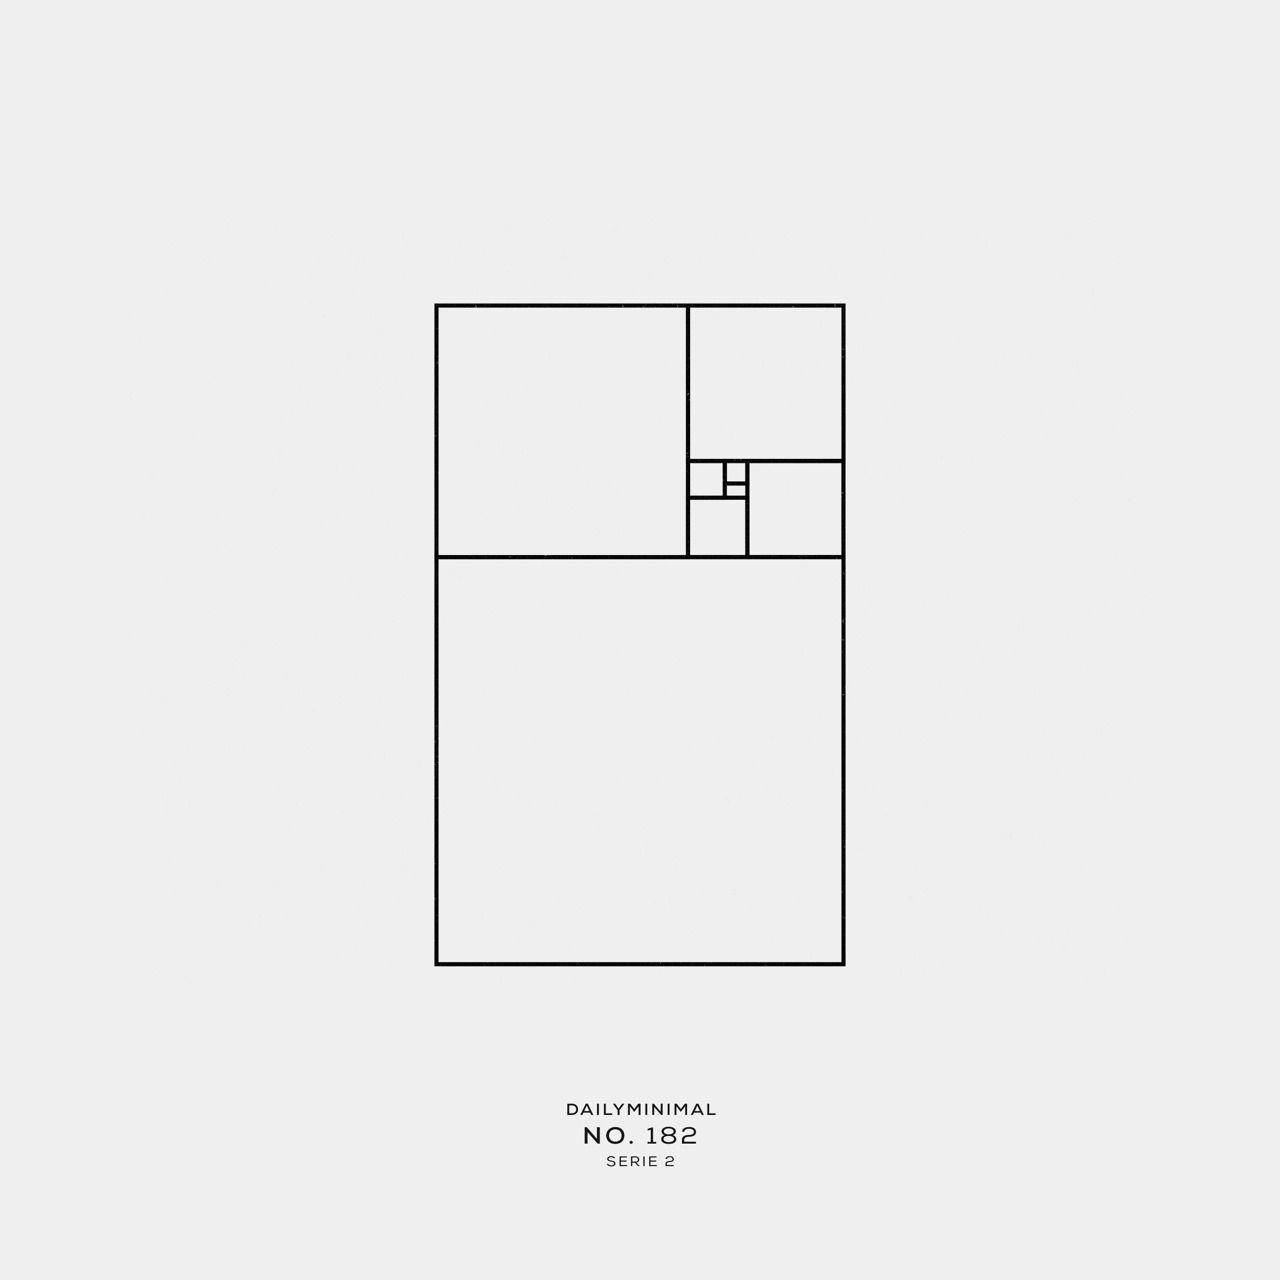 No 182 A New Geometric Design Every Day Minimal Shirt Design